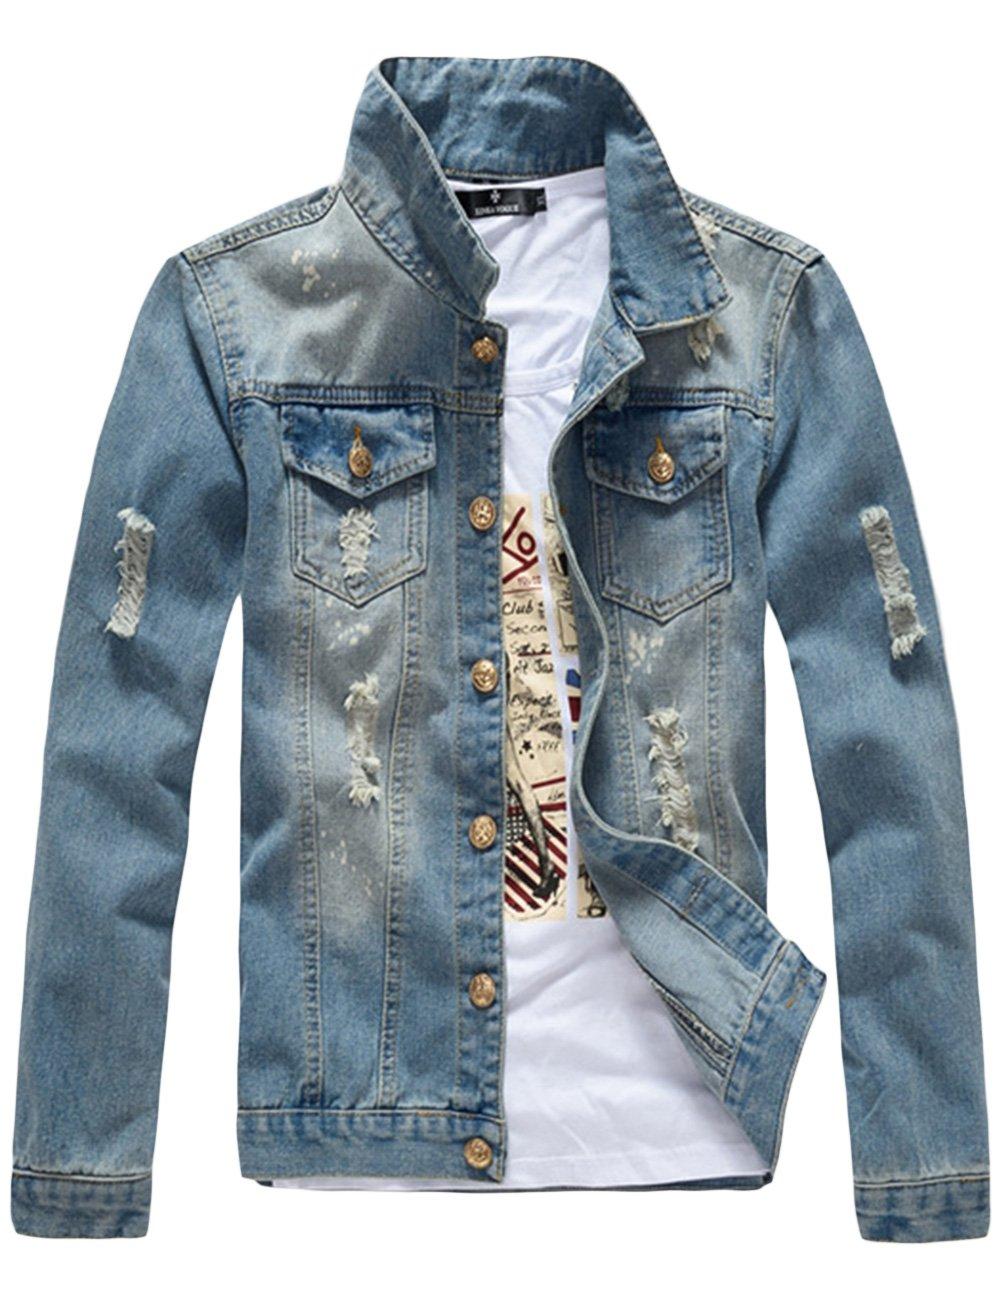 sandbank Men's Classic Button Slim Fit Ripped Washed Denim Jacket Jean Coat (Blue, Medium)